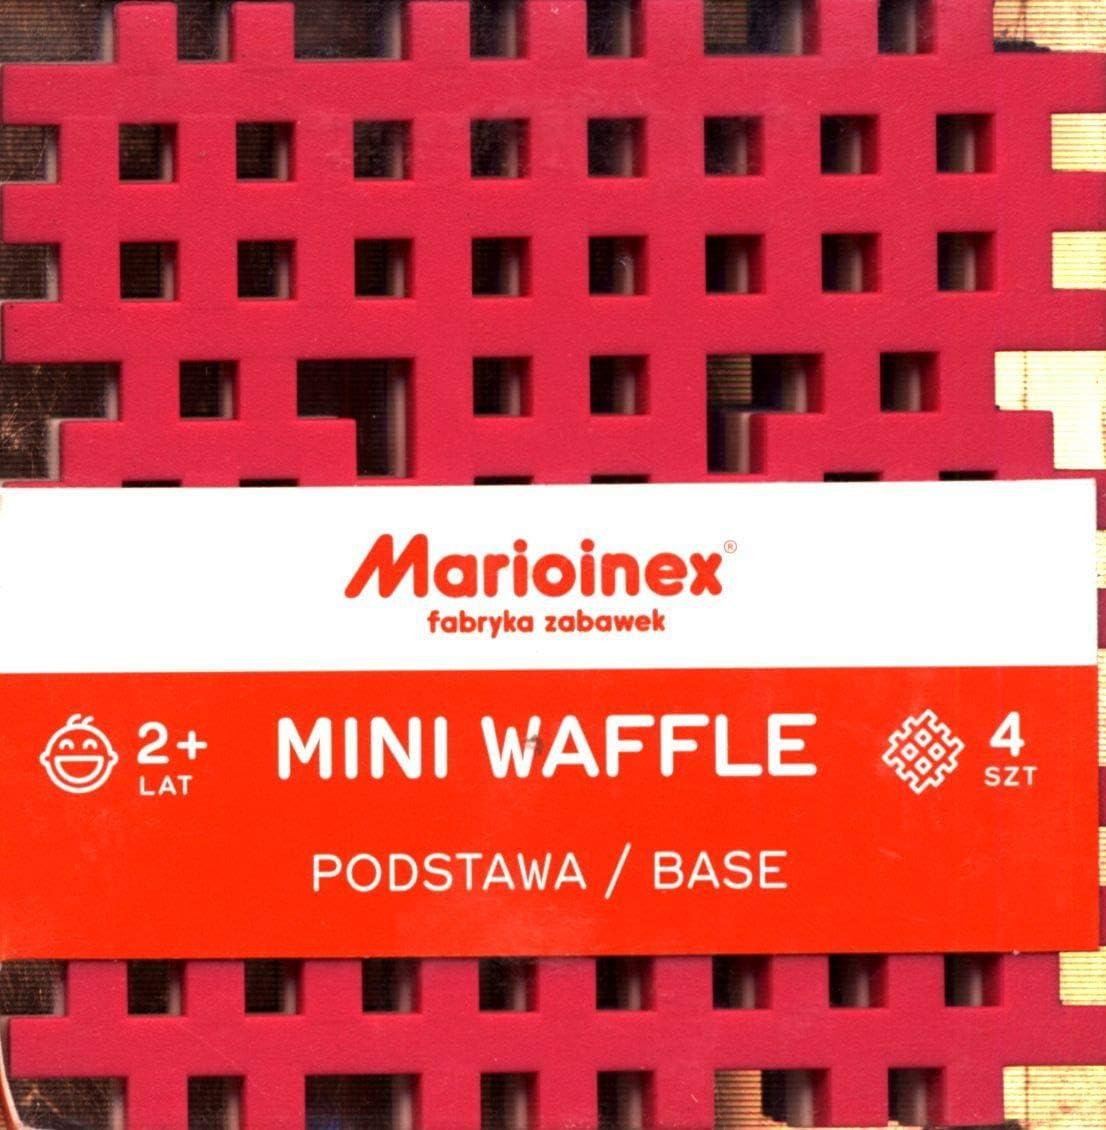 Mehrfarbig 4 St/ück Marioinex Mario-Inex 902608 Mini-Waffel-Basis